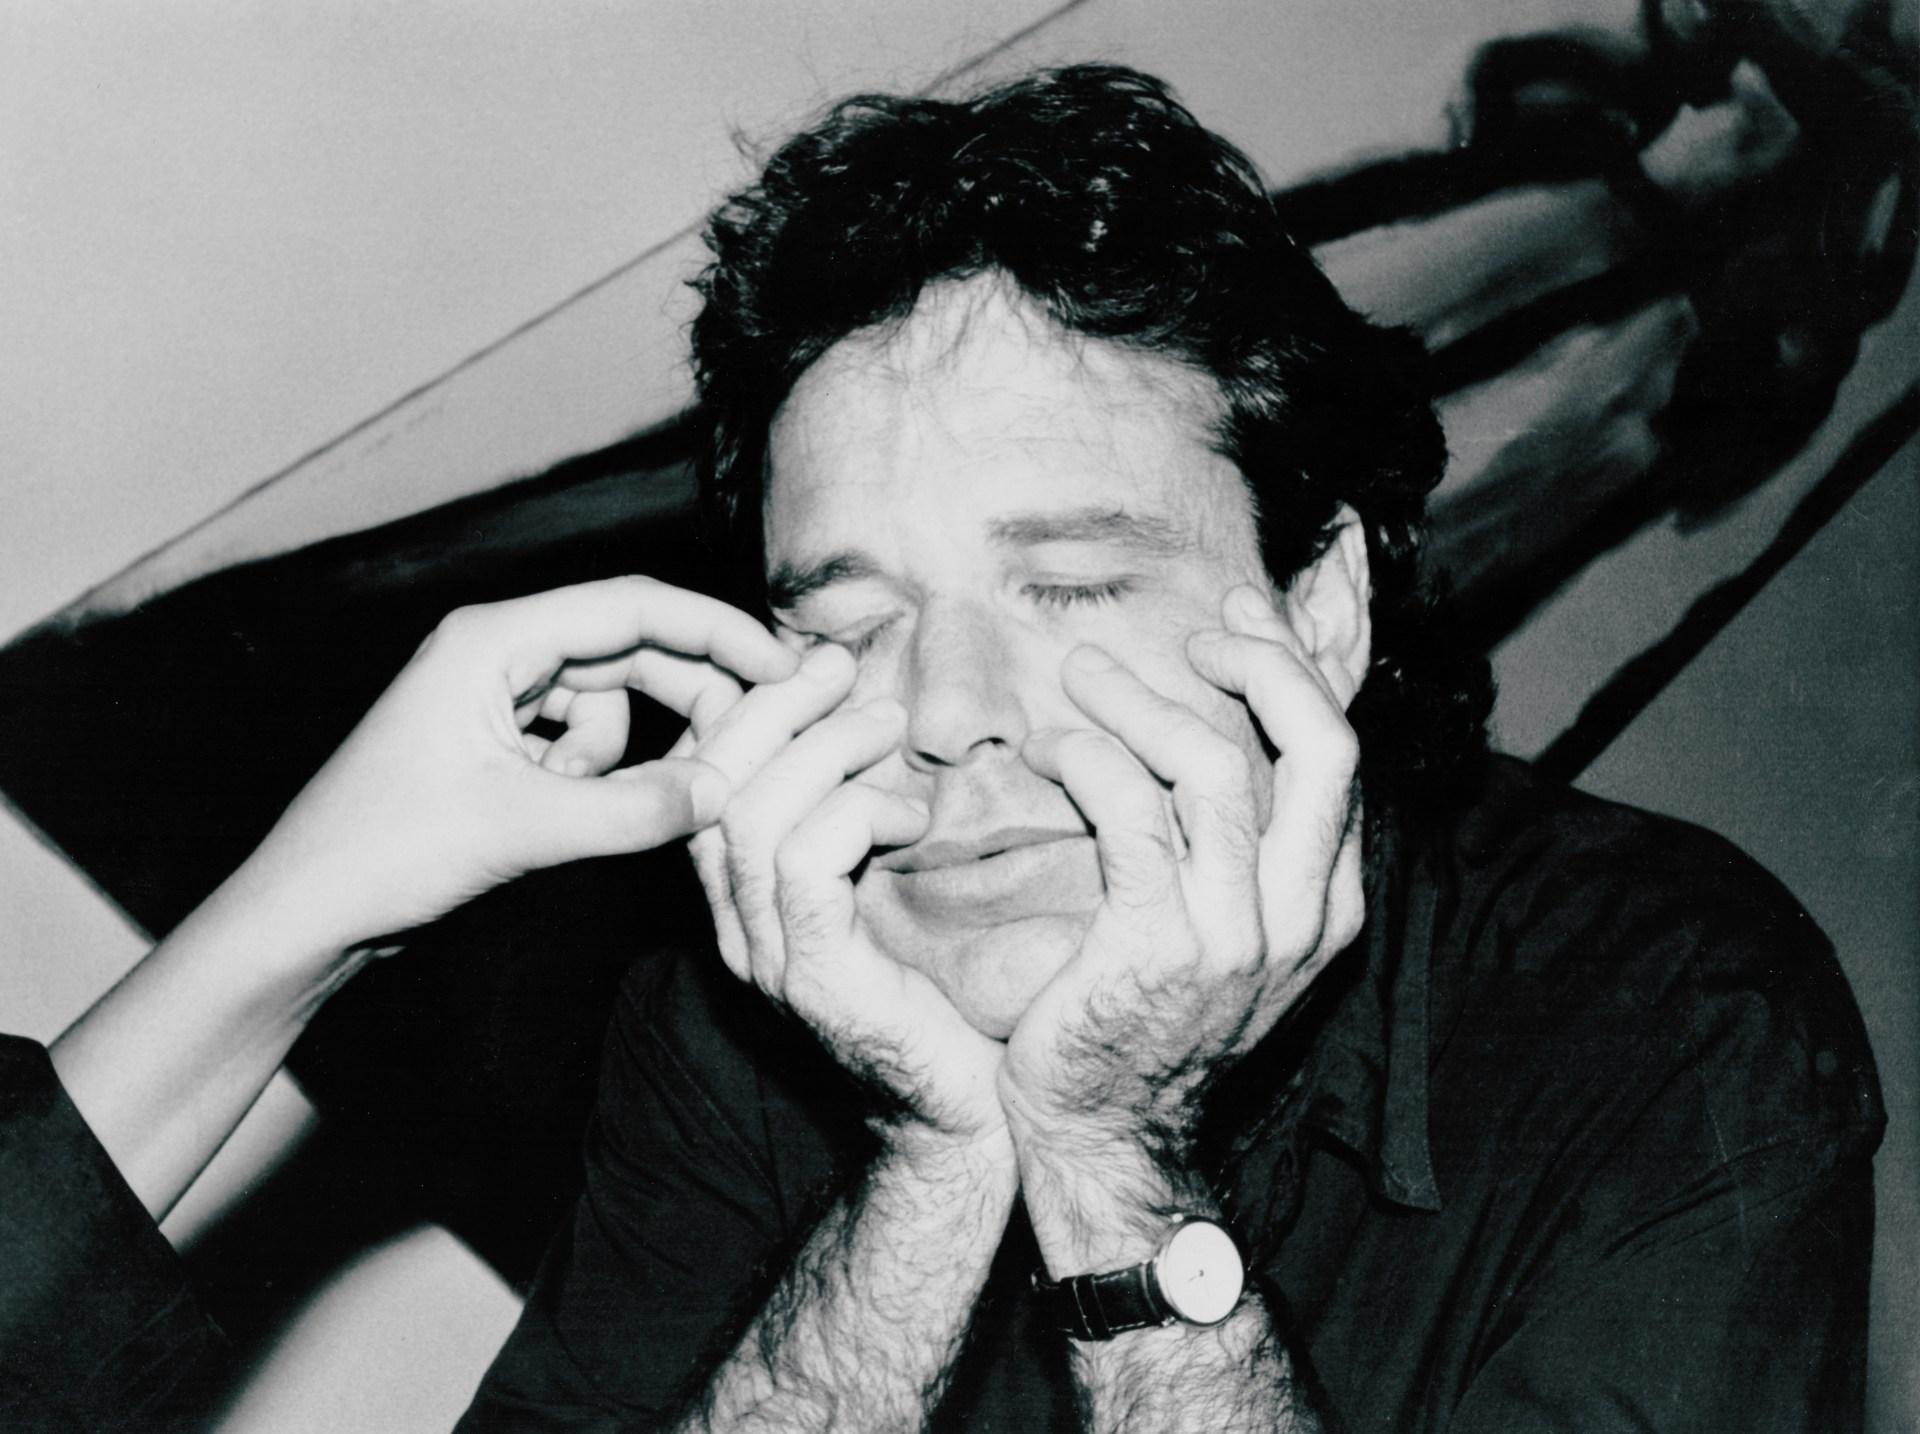 Israeli keyboardist Raviv Gazit's '80s electronica reissued on vinyl.